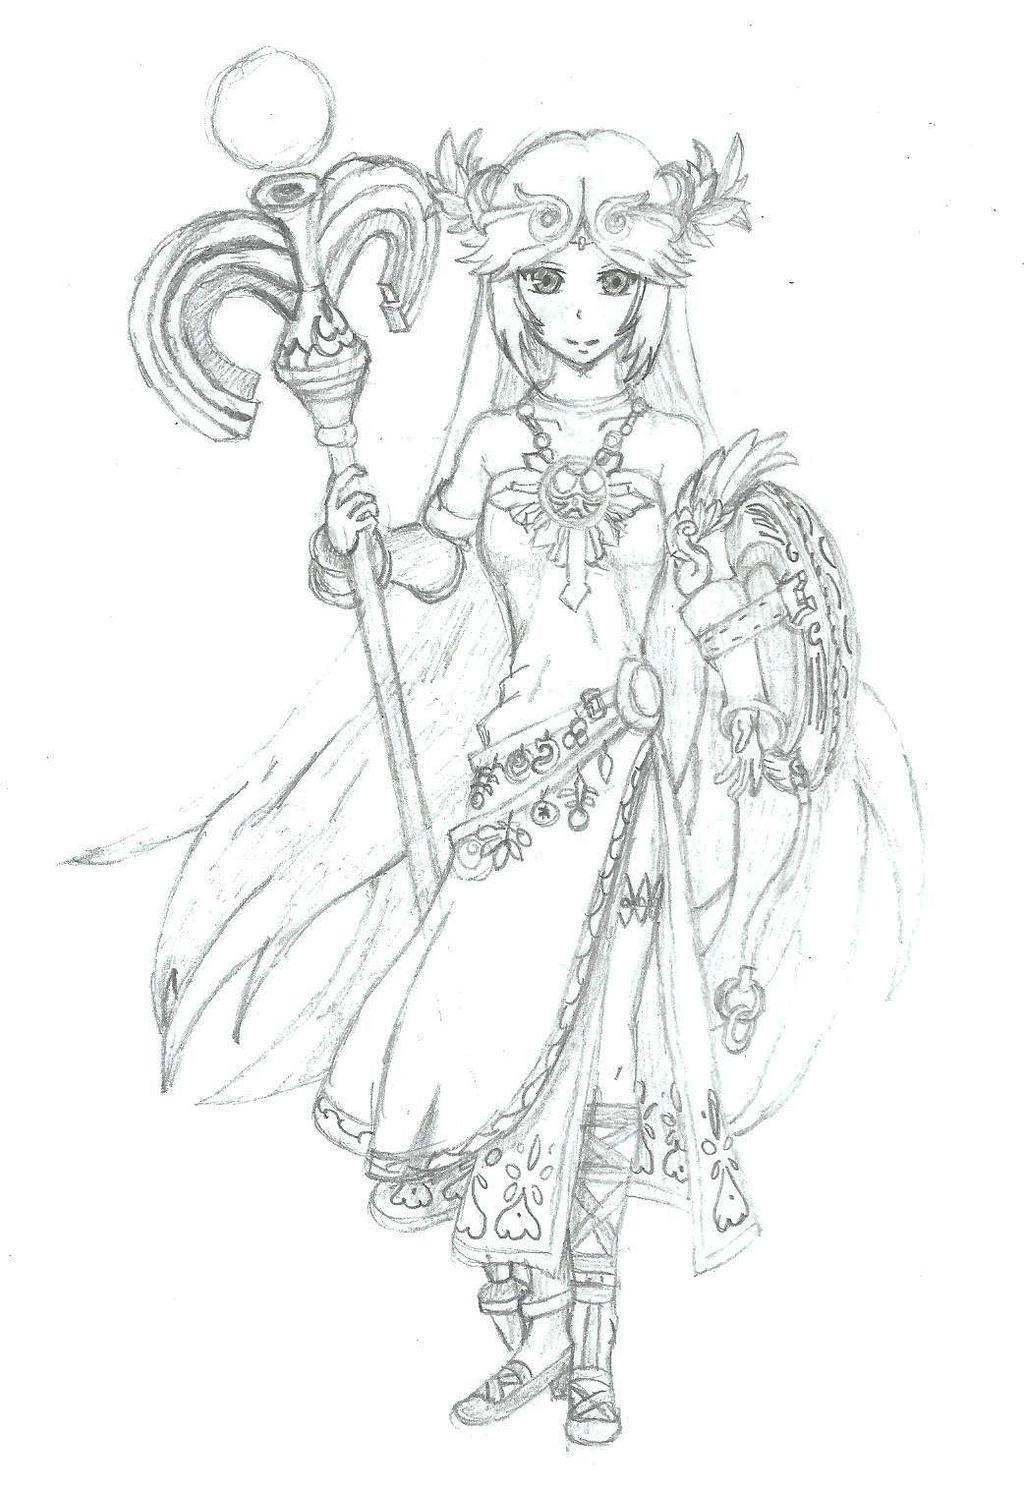 Kid Icarus Palutena By BurningTiger9000 On DeviantArt